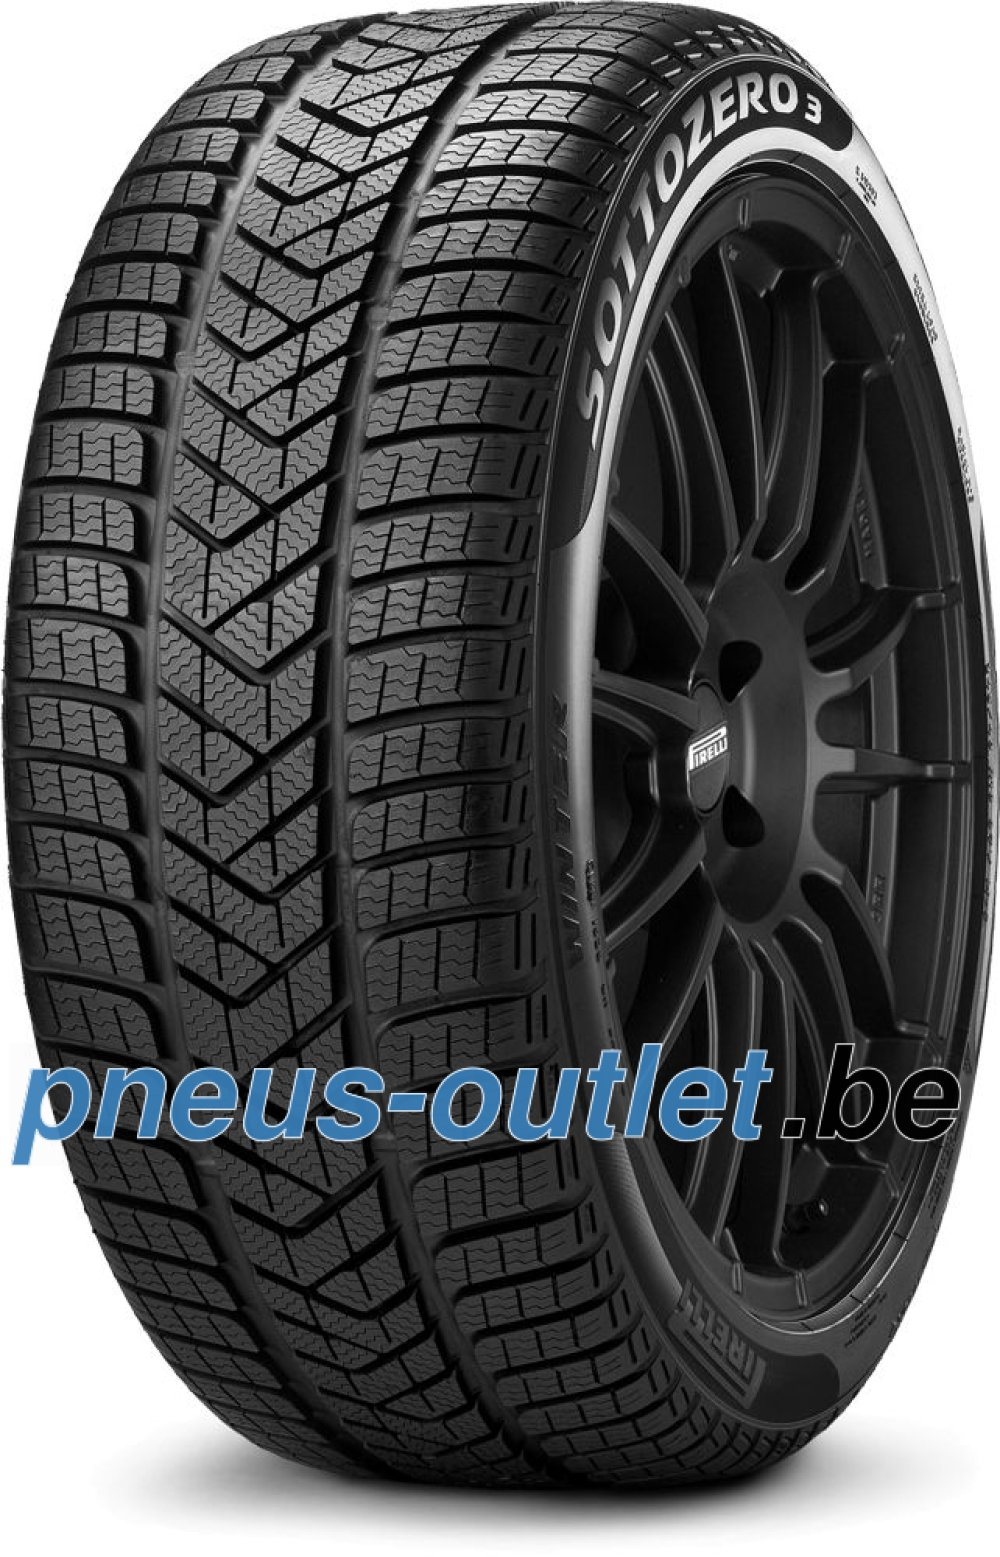 Pirelli Winter SottoZero 3 ( 245/35 R21 96W XL , MGT )